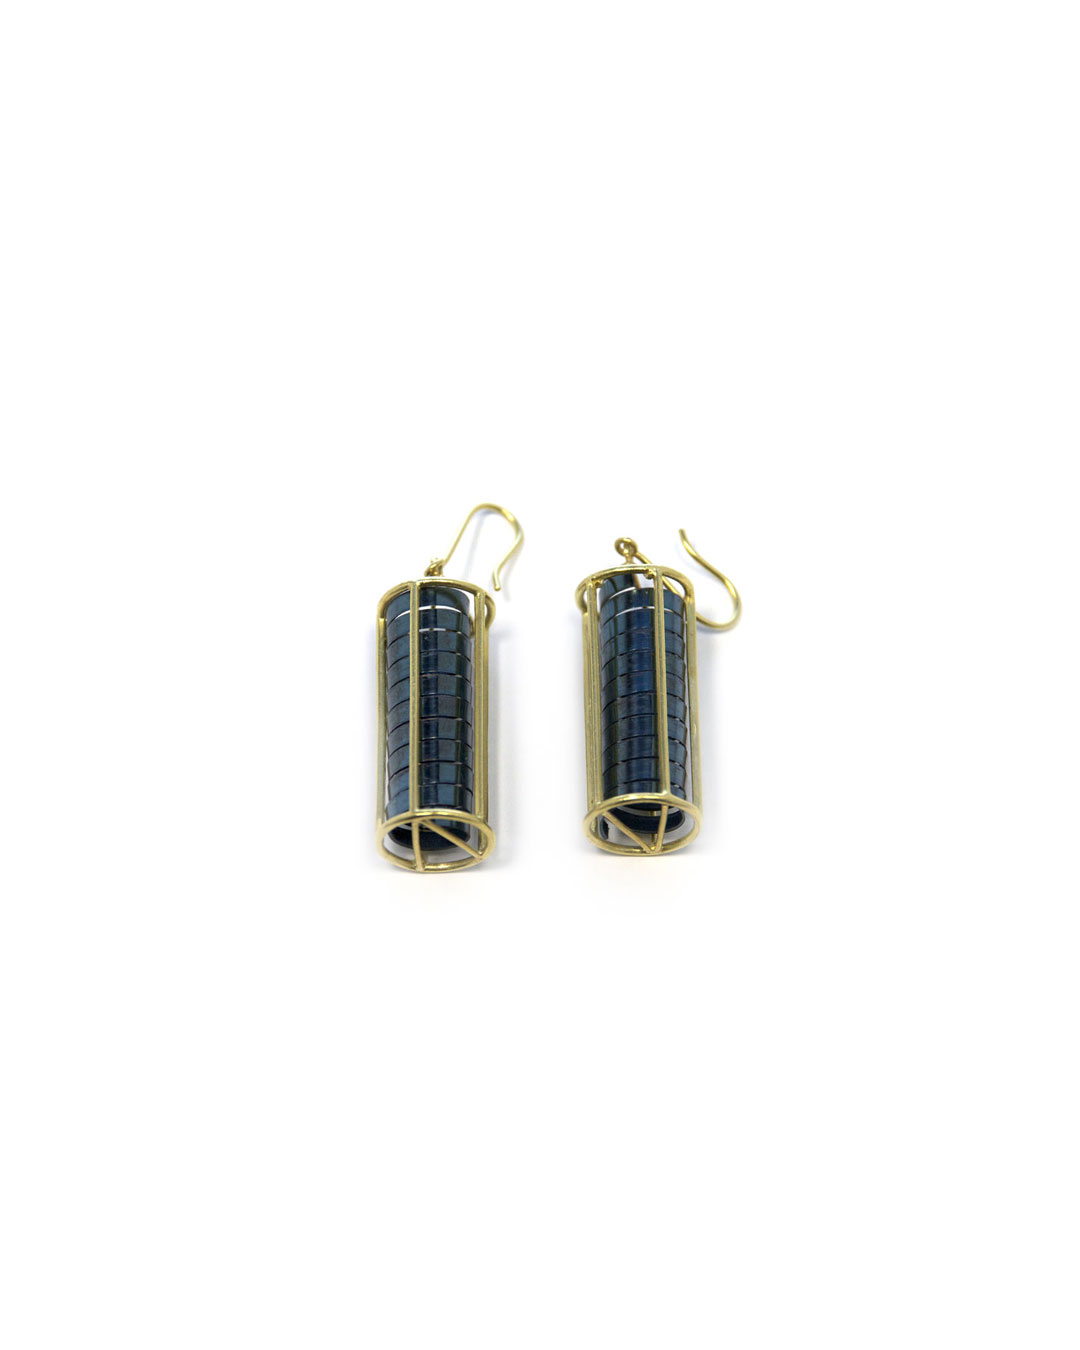 Okinari Kurokawa, untitled, 2013, earrings; 18ct gold, stainless steel, 39 x 13 x 13 mm